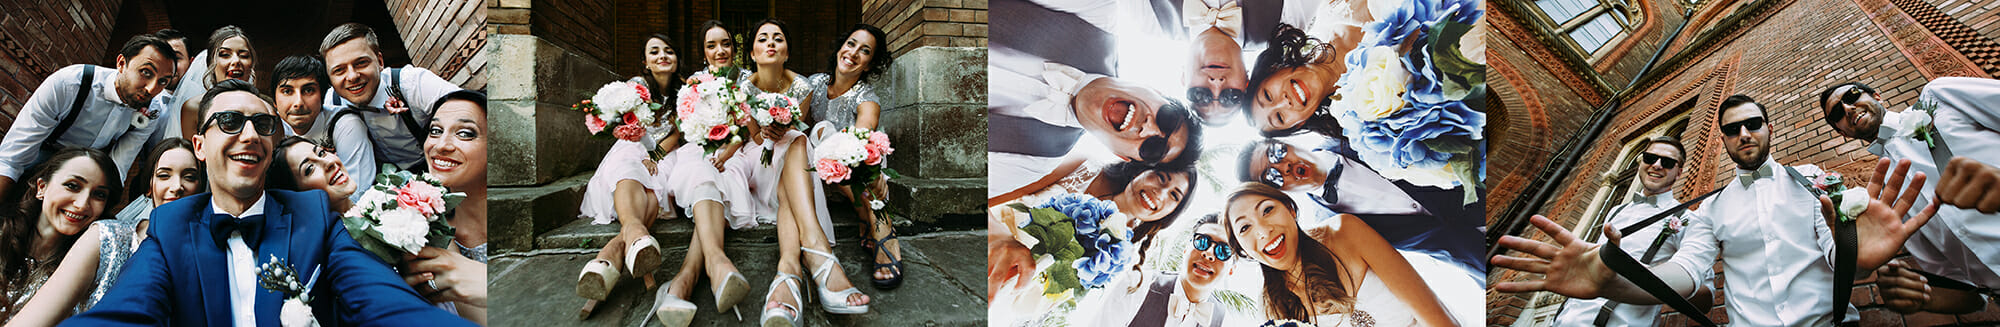 creative wedding photography shots